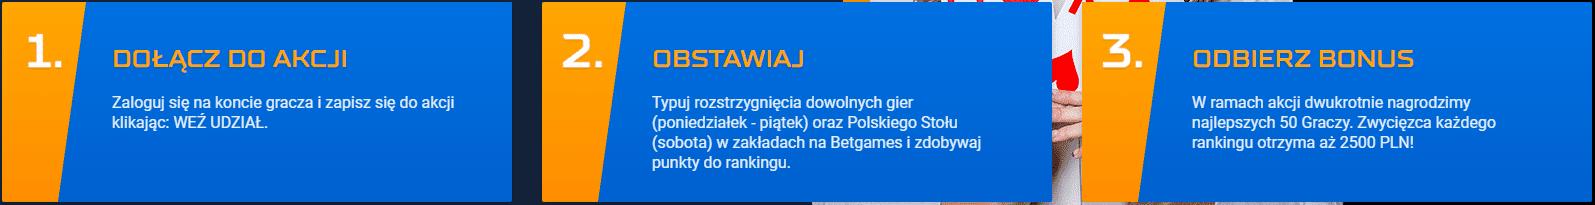 STS ranking